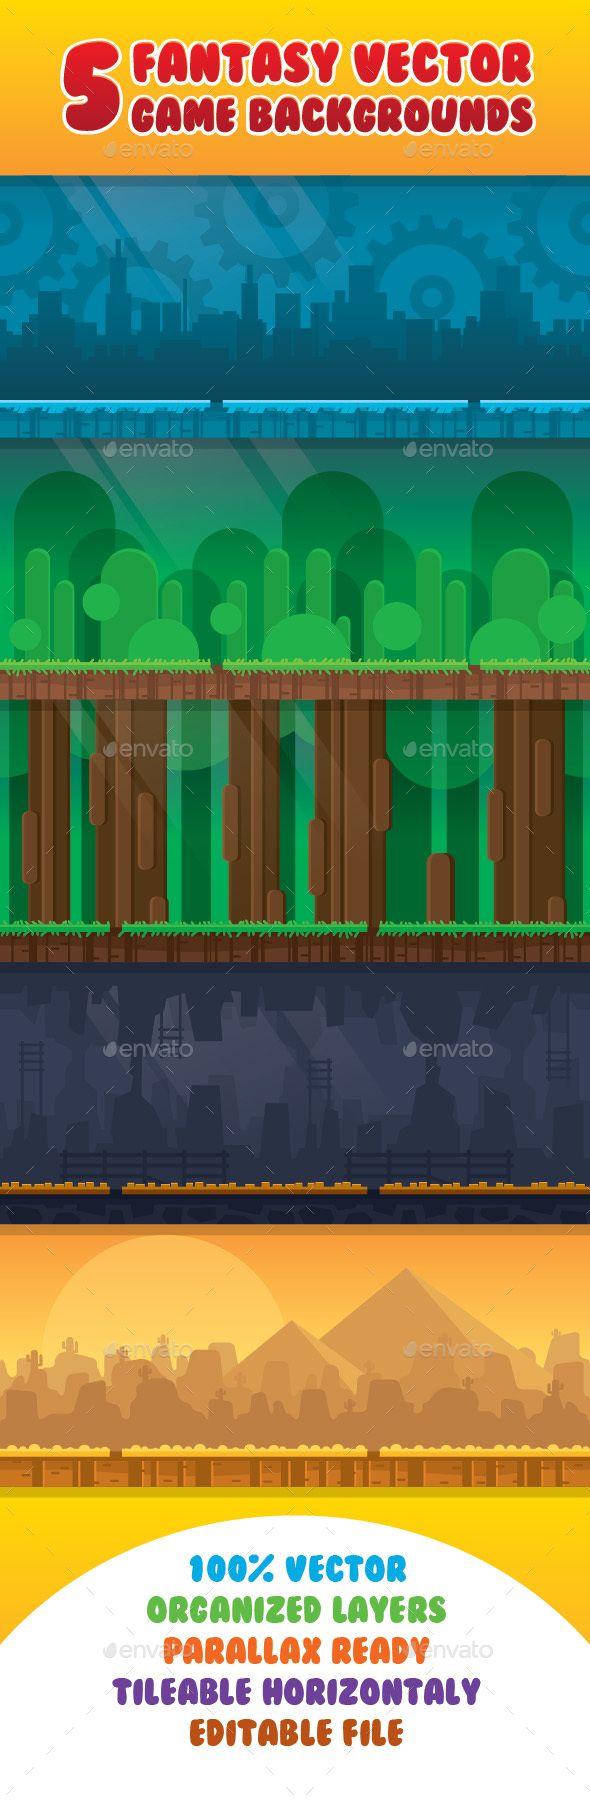 Fantasy Vector Game Background